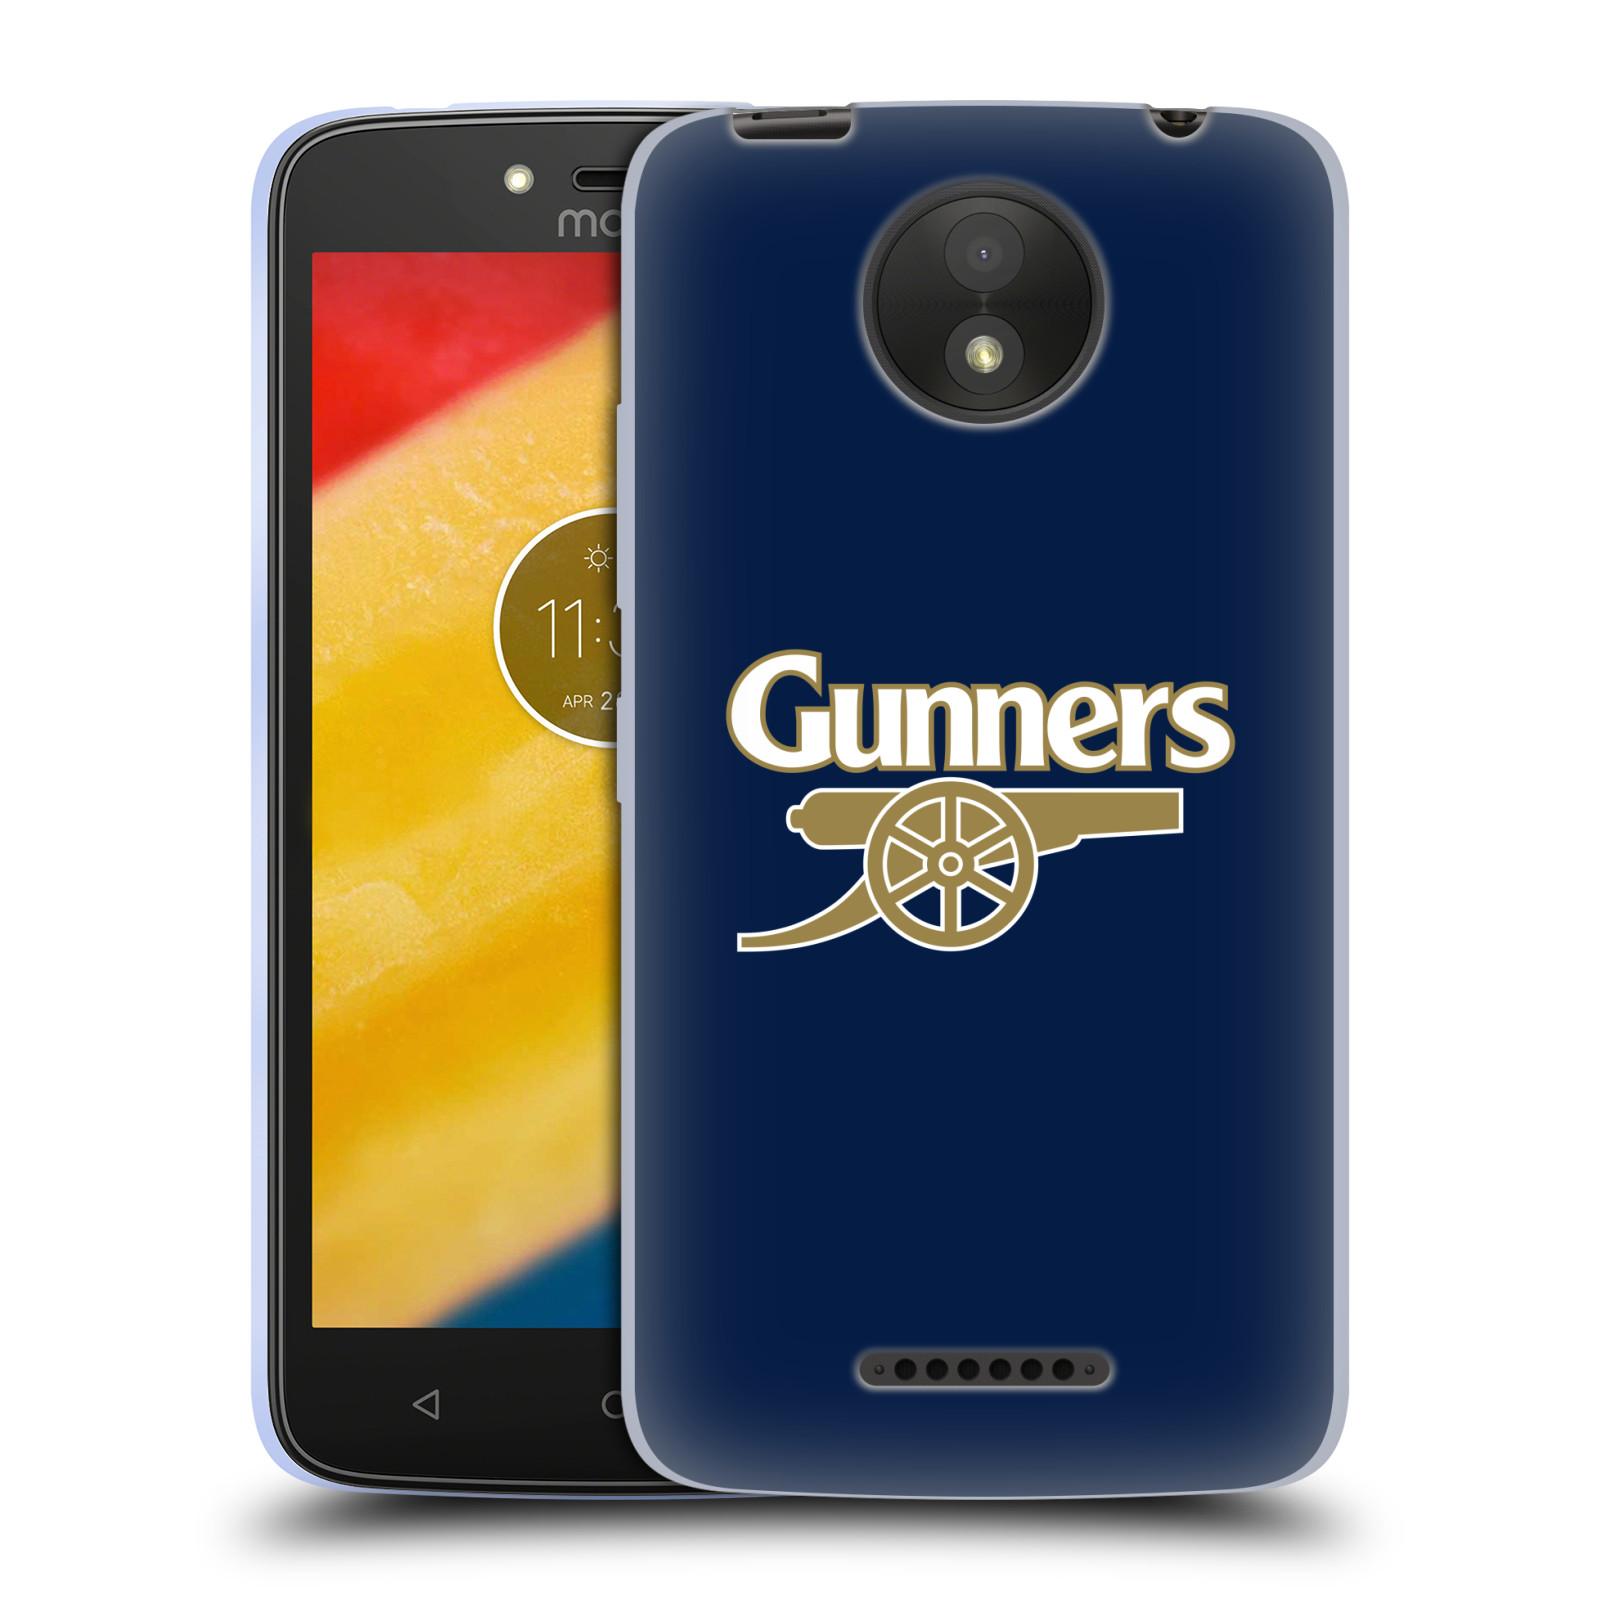 Silikonové pouzdro na mobil Lenovo Moto C Plus - Head Case - Arsenal FC - Gunners